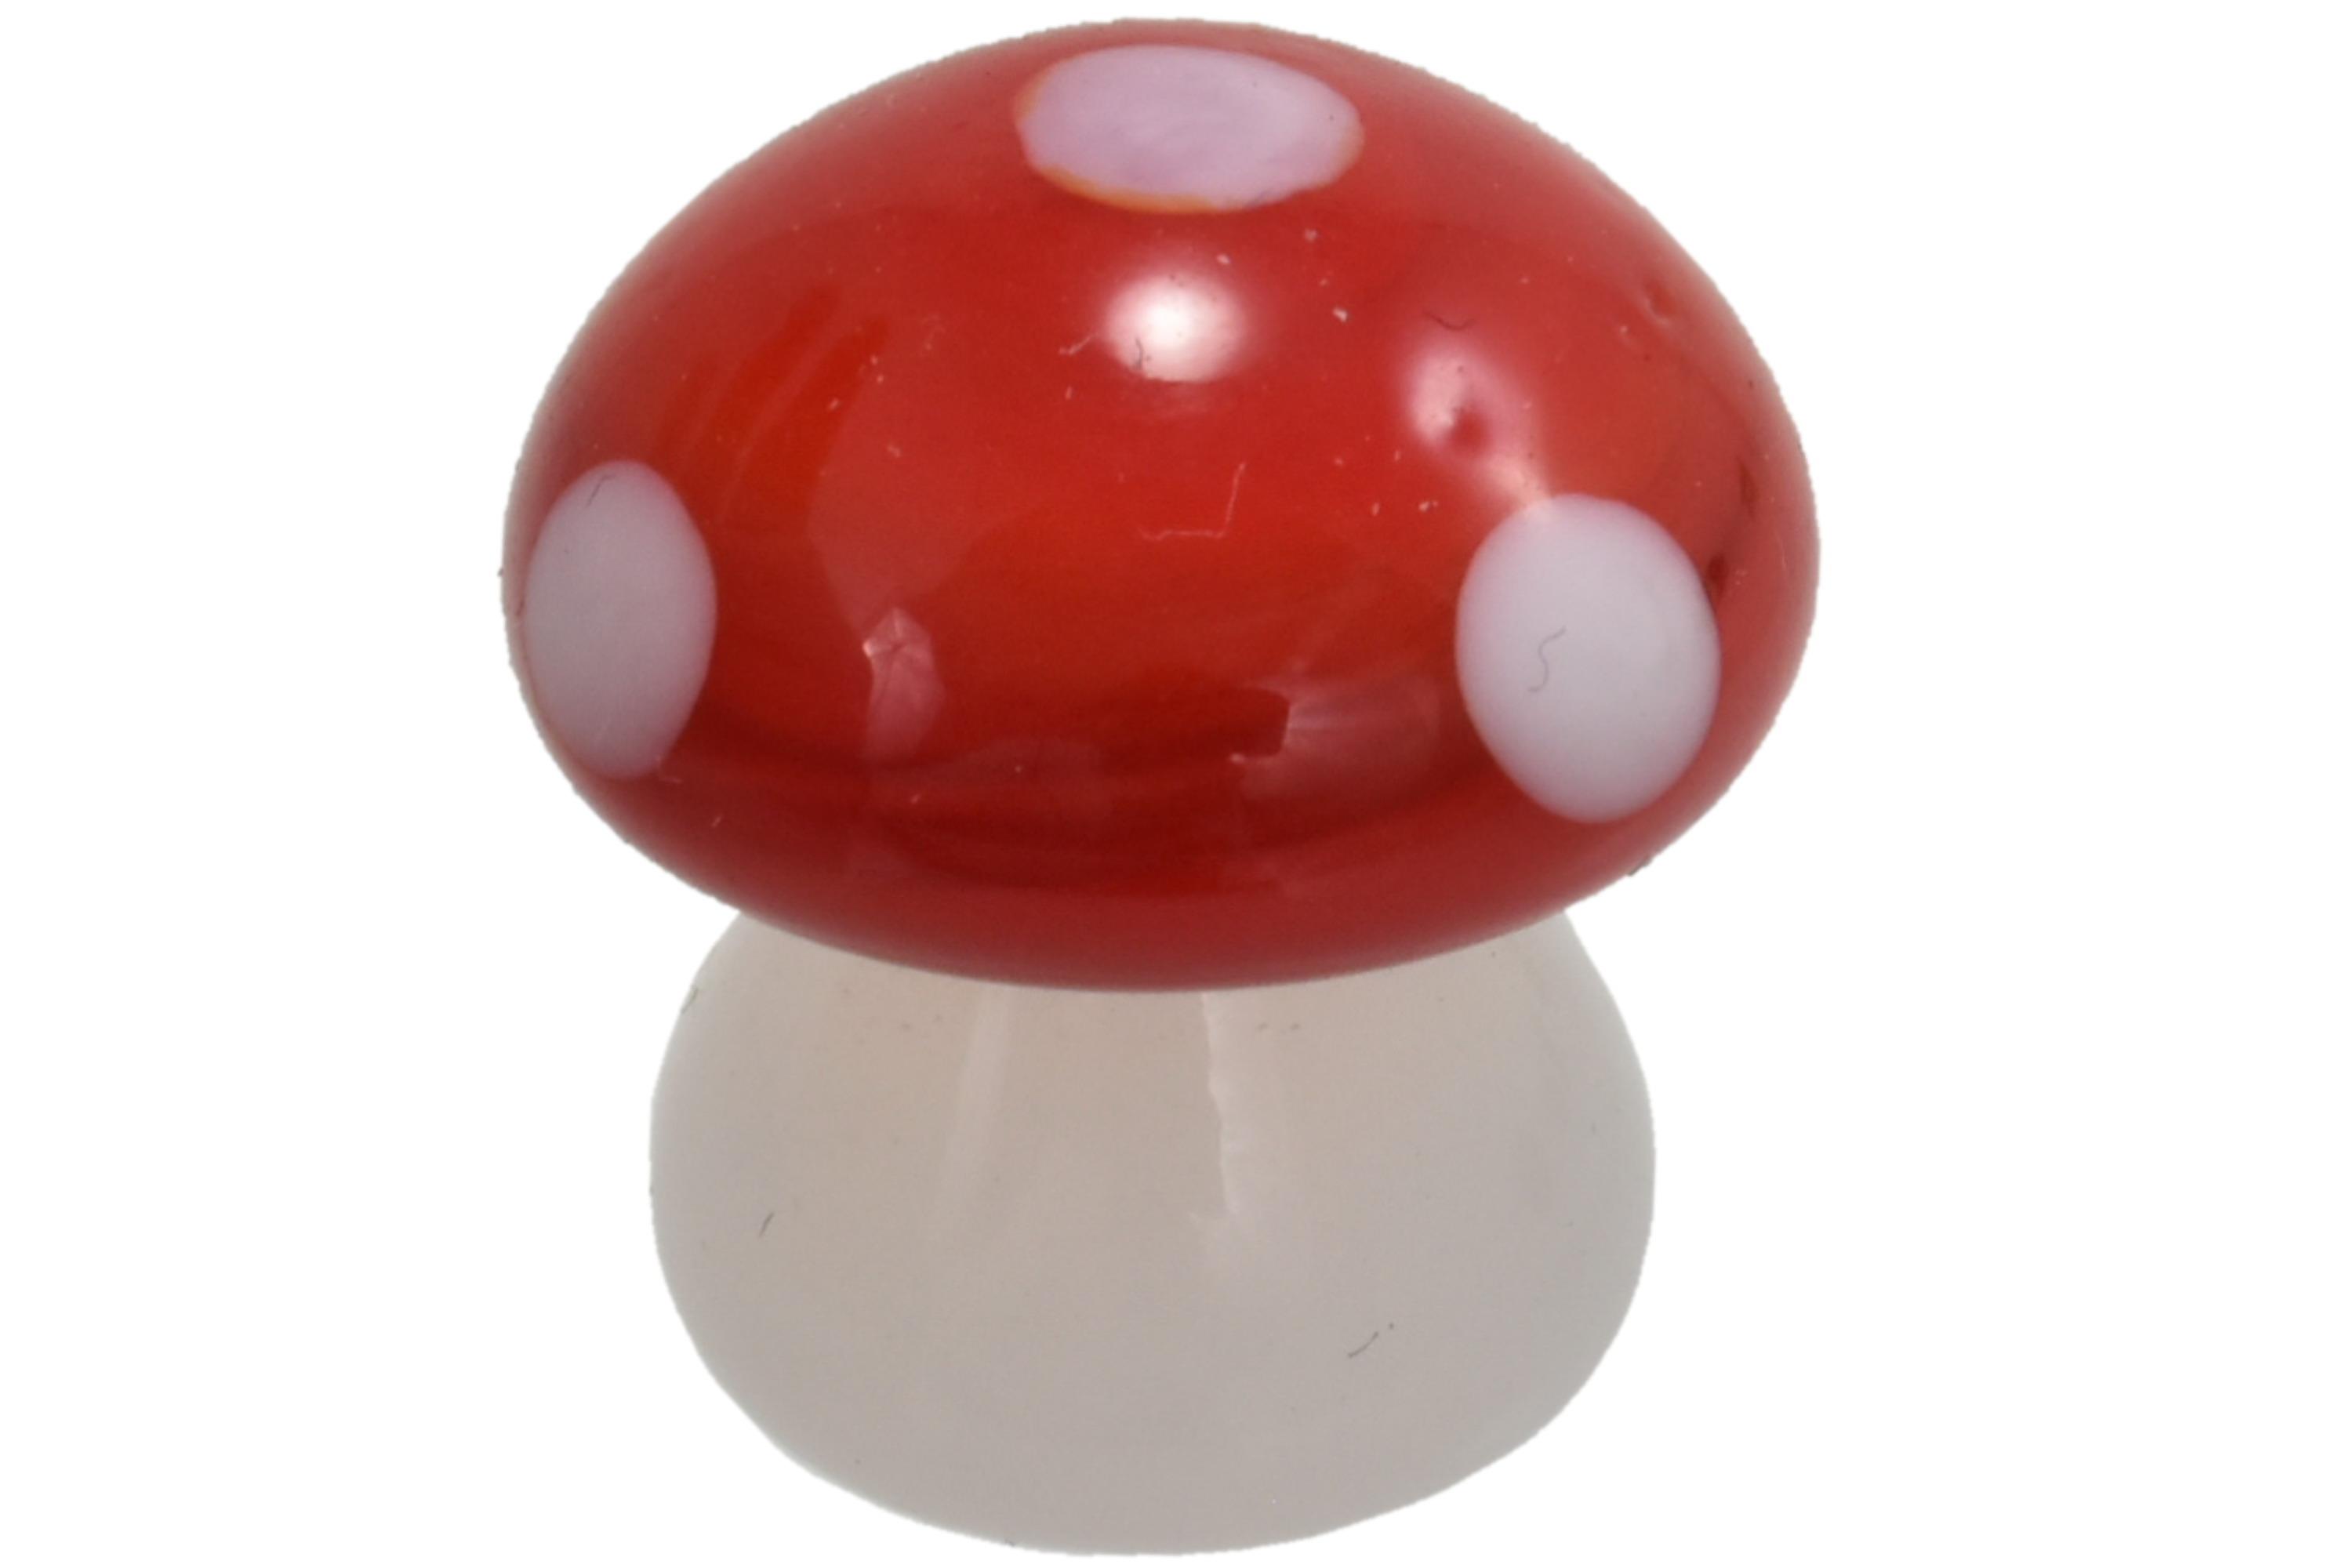 2cm Glass Mushroom Ornament